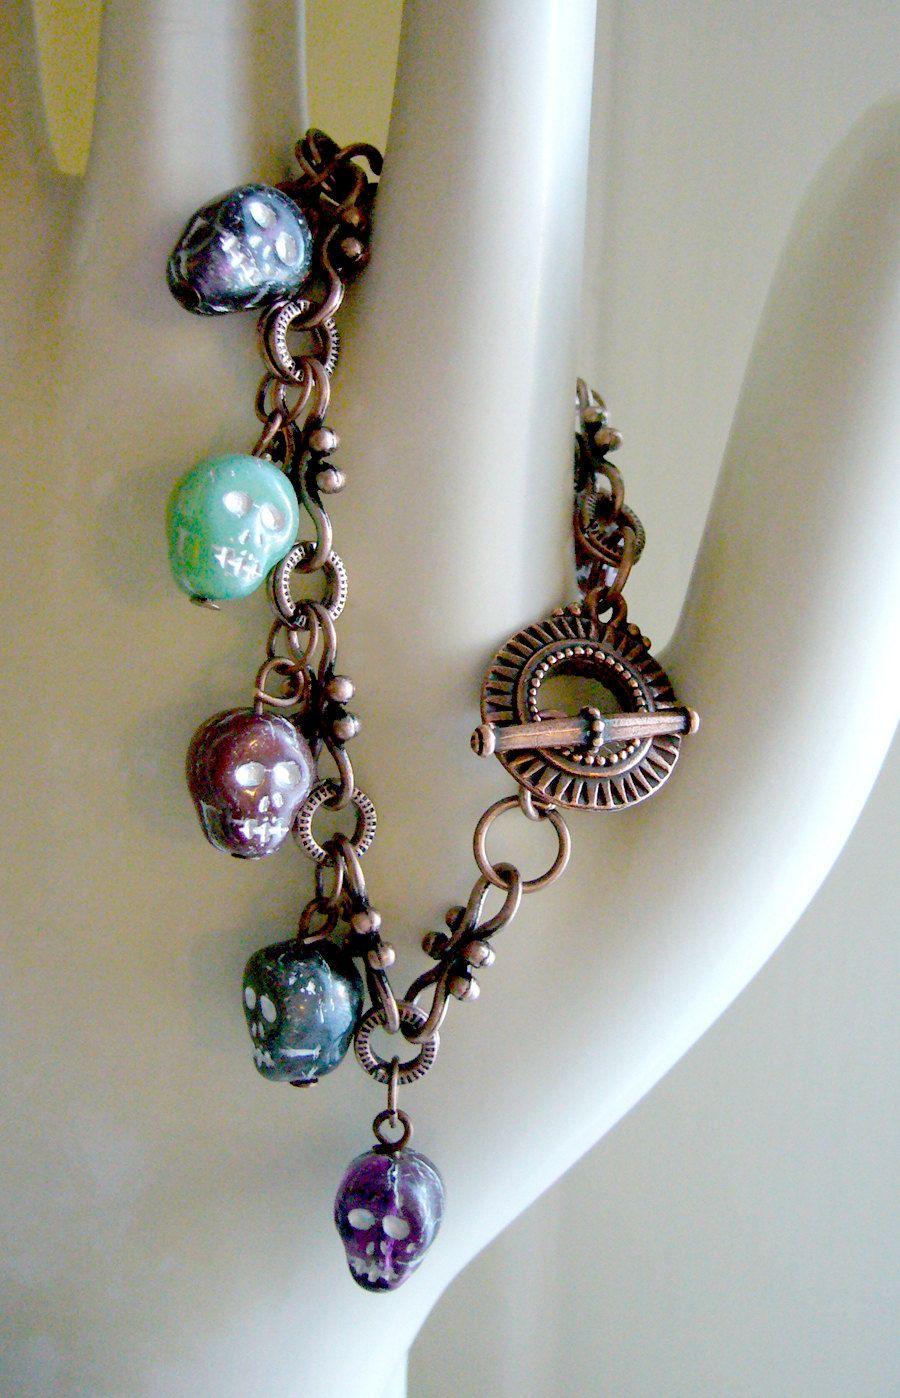 Tattoo accessory seven skulls charm bracelet memento mori day of